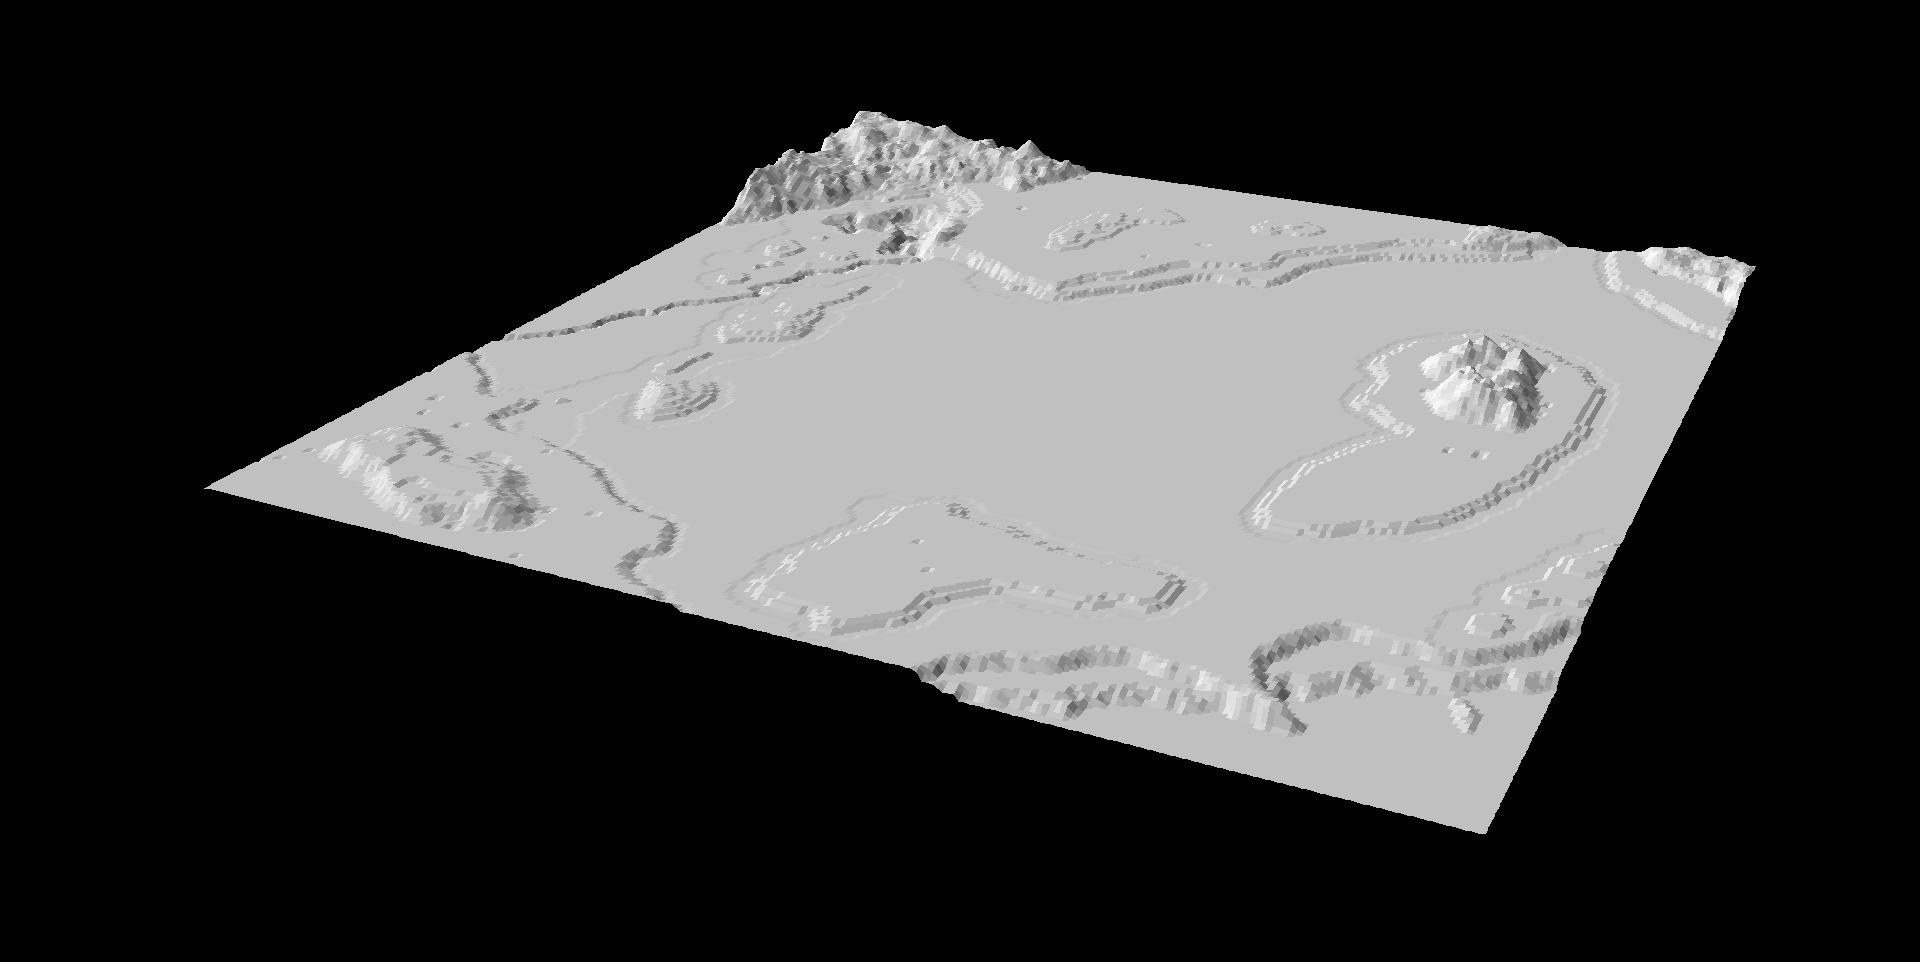 https://neorail.jp/forum/uploads/map_metropolitan_init_heightmap_R_0.5_0621-1700.png